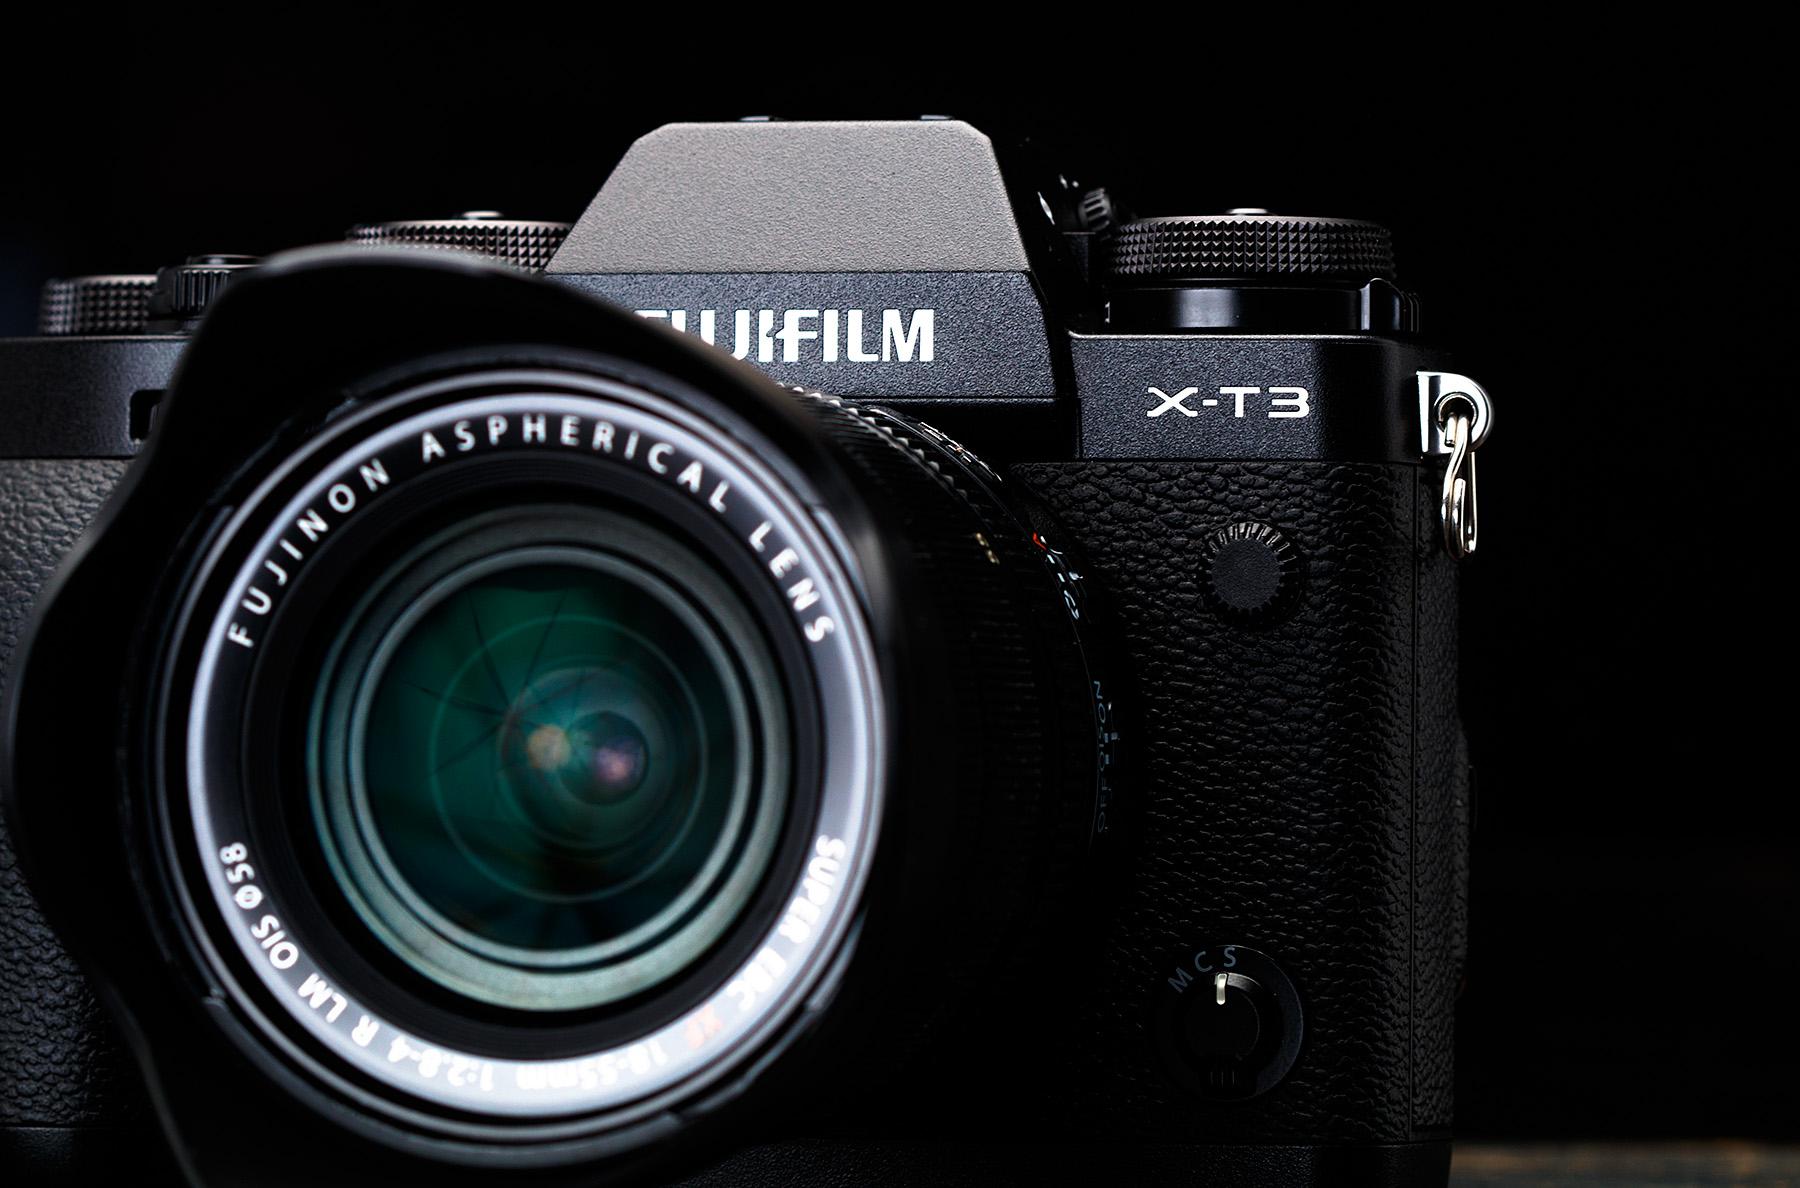 https://www.dpreview.com/files/p/articles/3691262631/body-shots/FujifilmXT3-01.jpeg